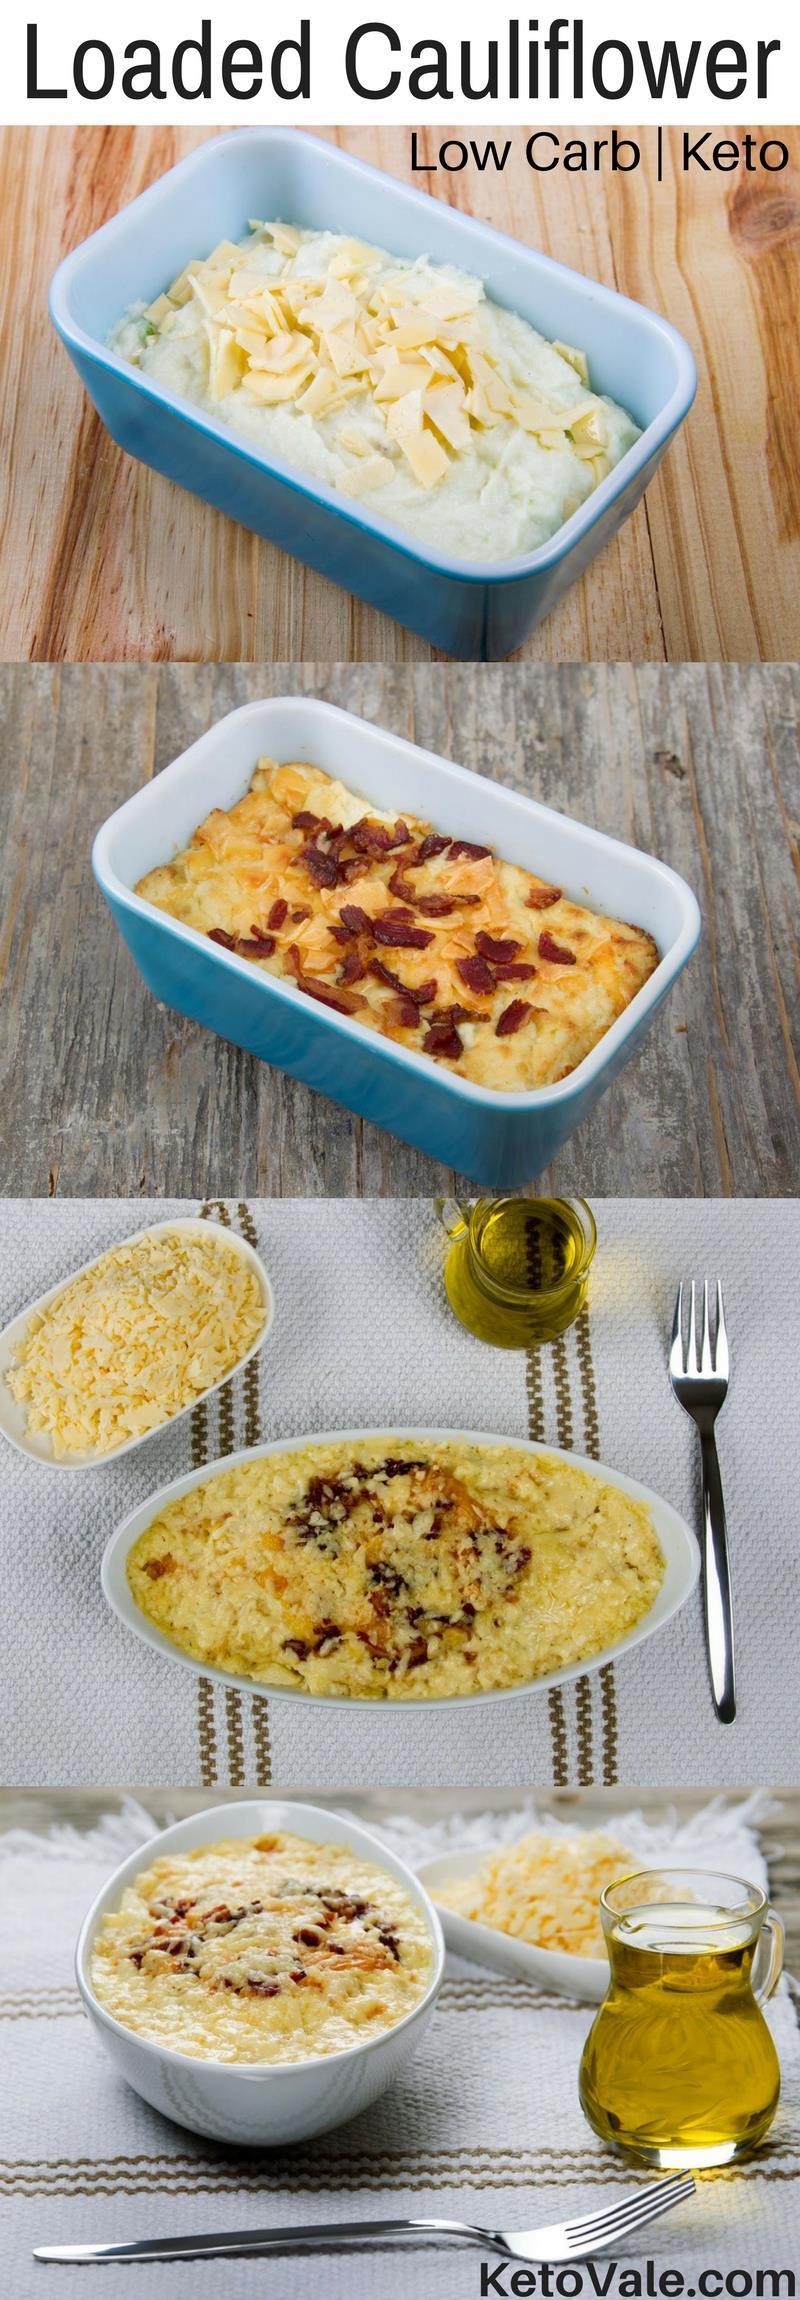 Cheesy Loaded Cauliflower Bake Low Carb Recipe #loadedcauliflowerbake